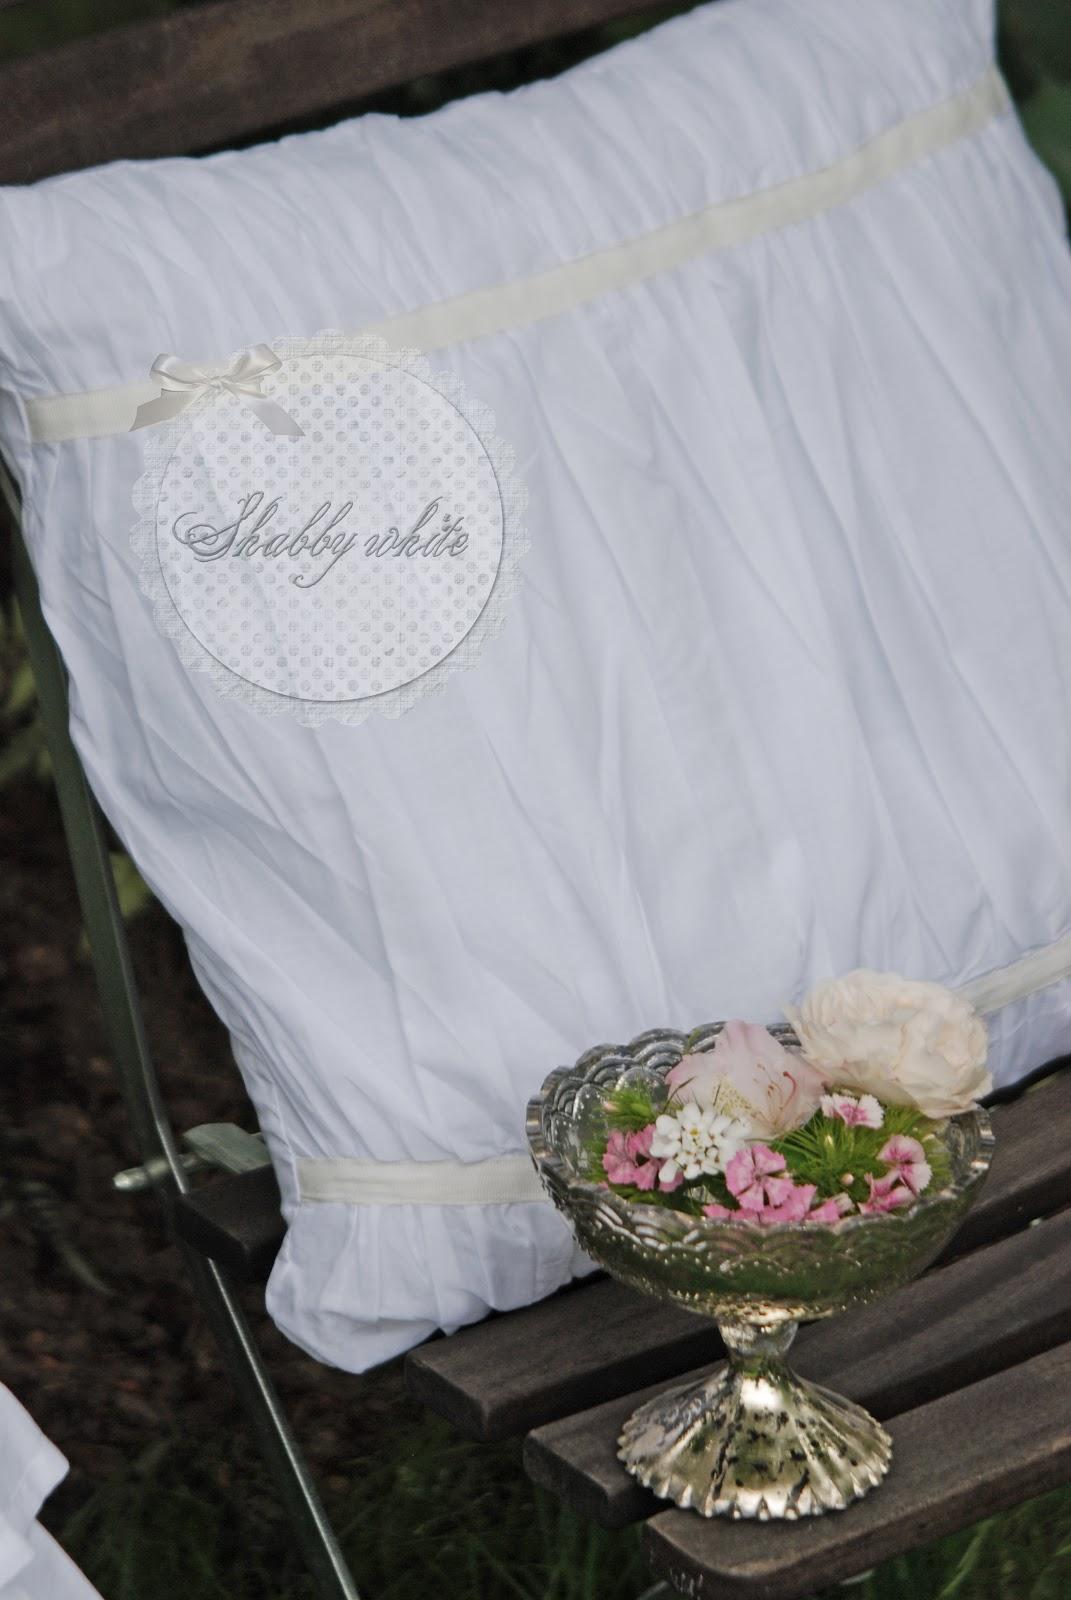 Weisse Shabby chic Kissen | Cottagedreams